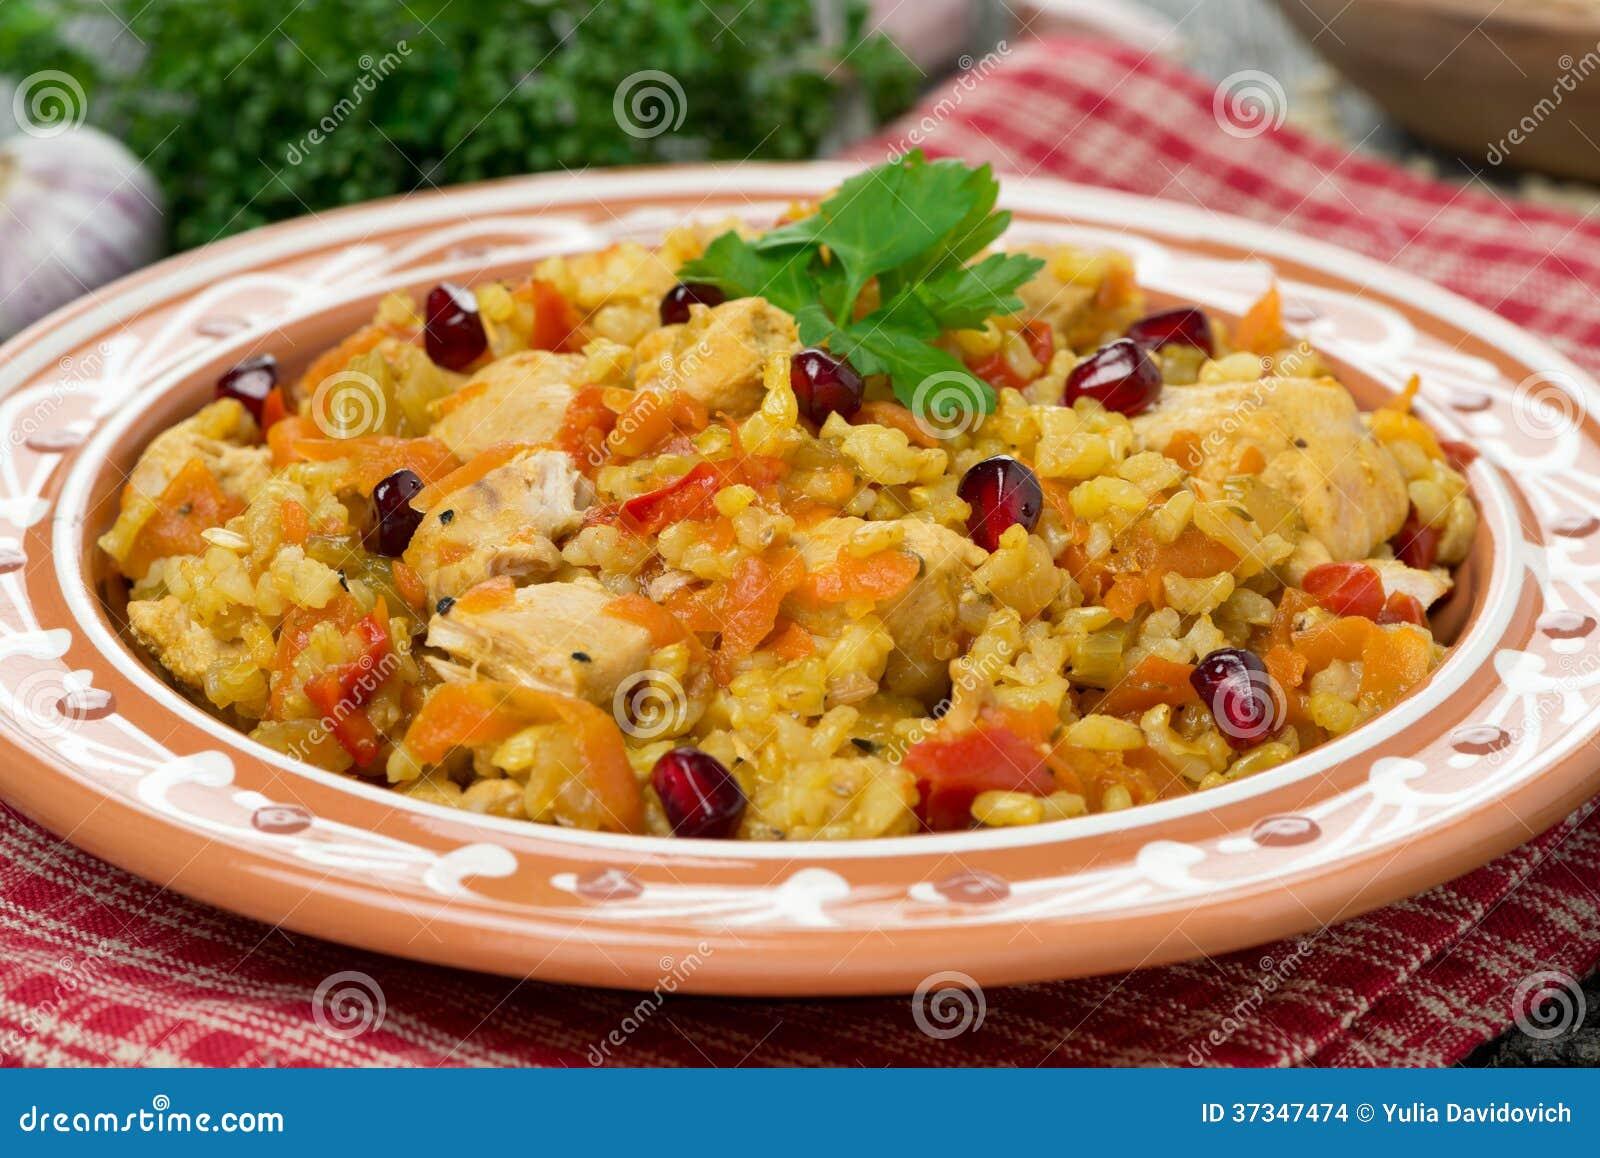 Pilau met groenten, kip en granaatappel, close-up